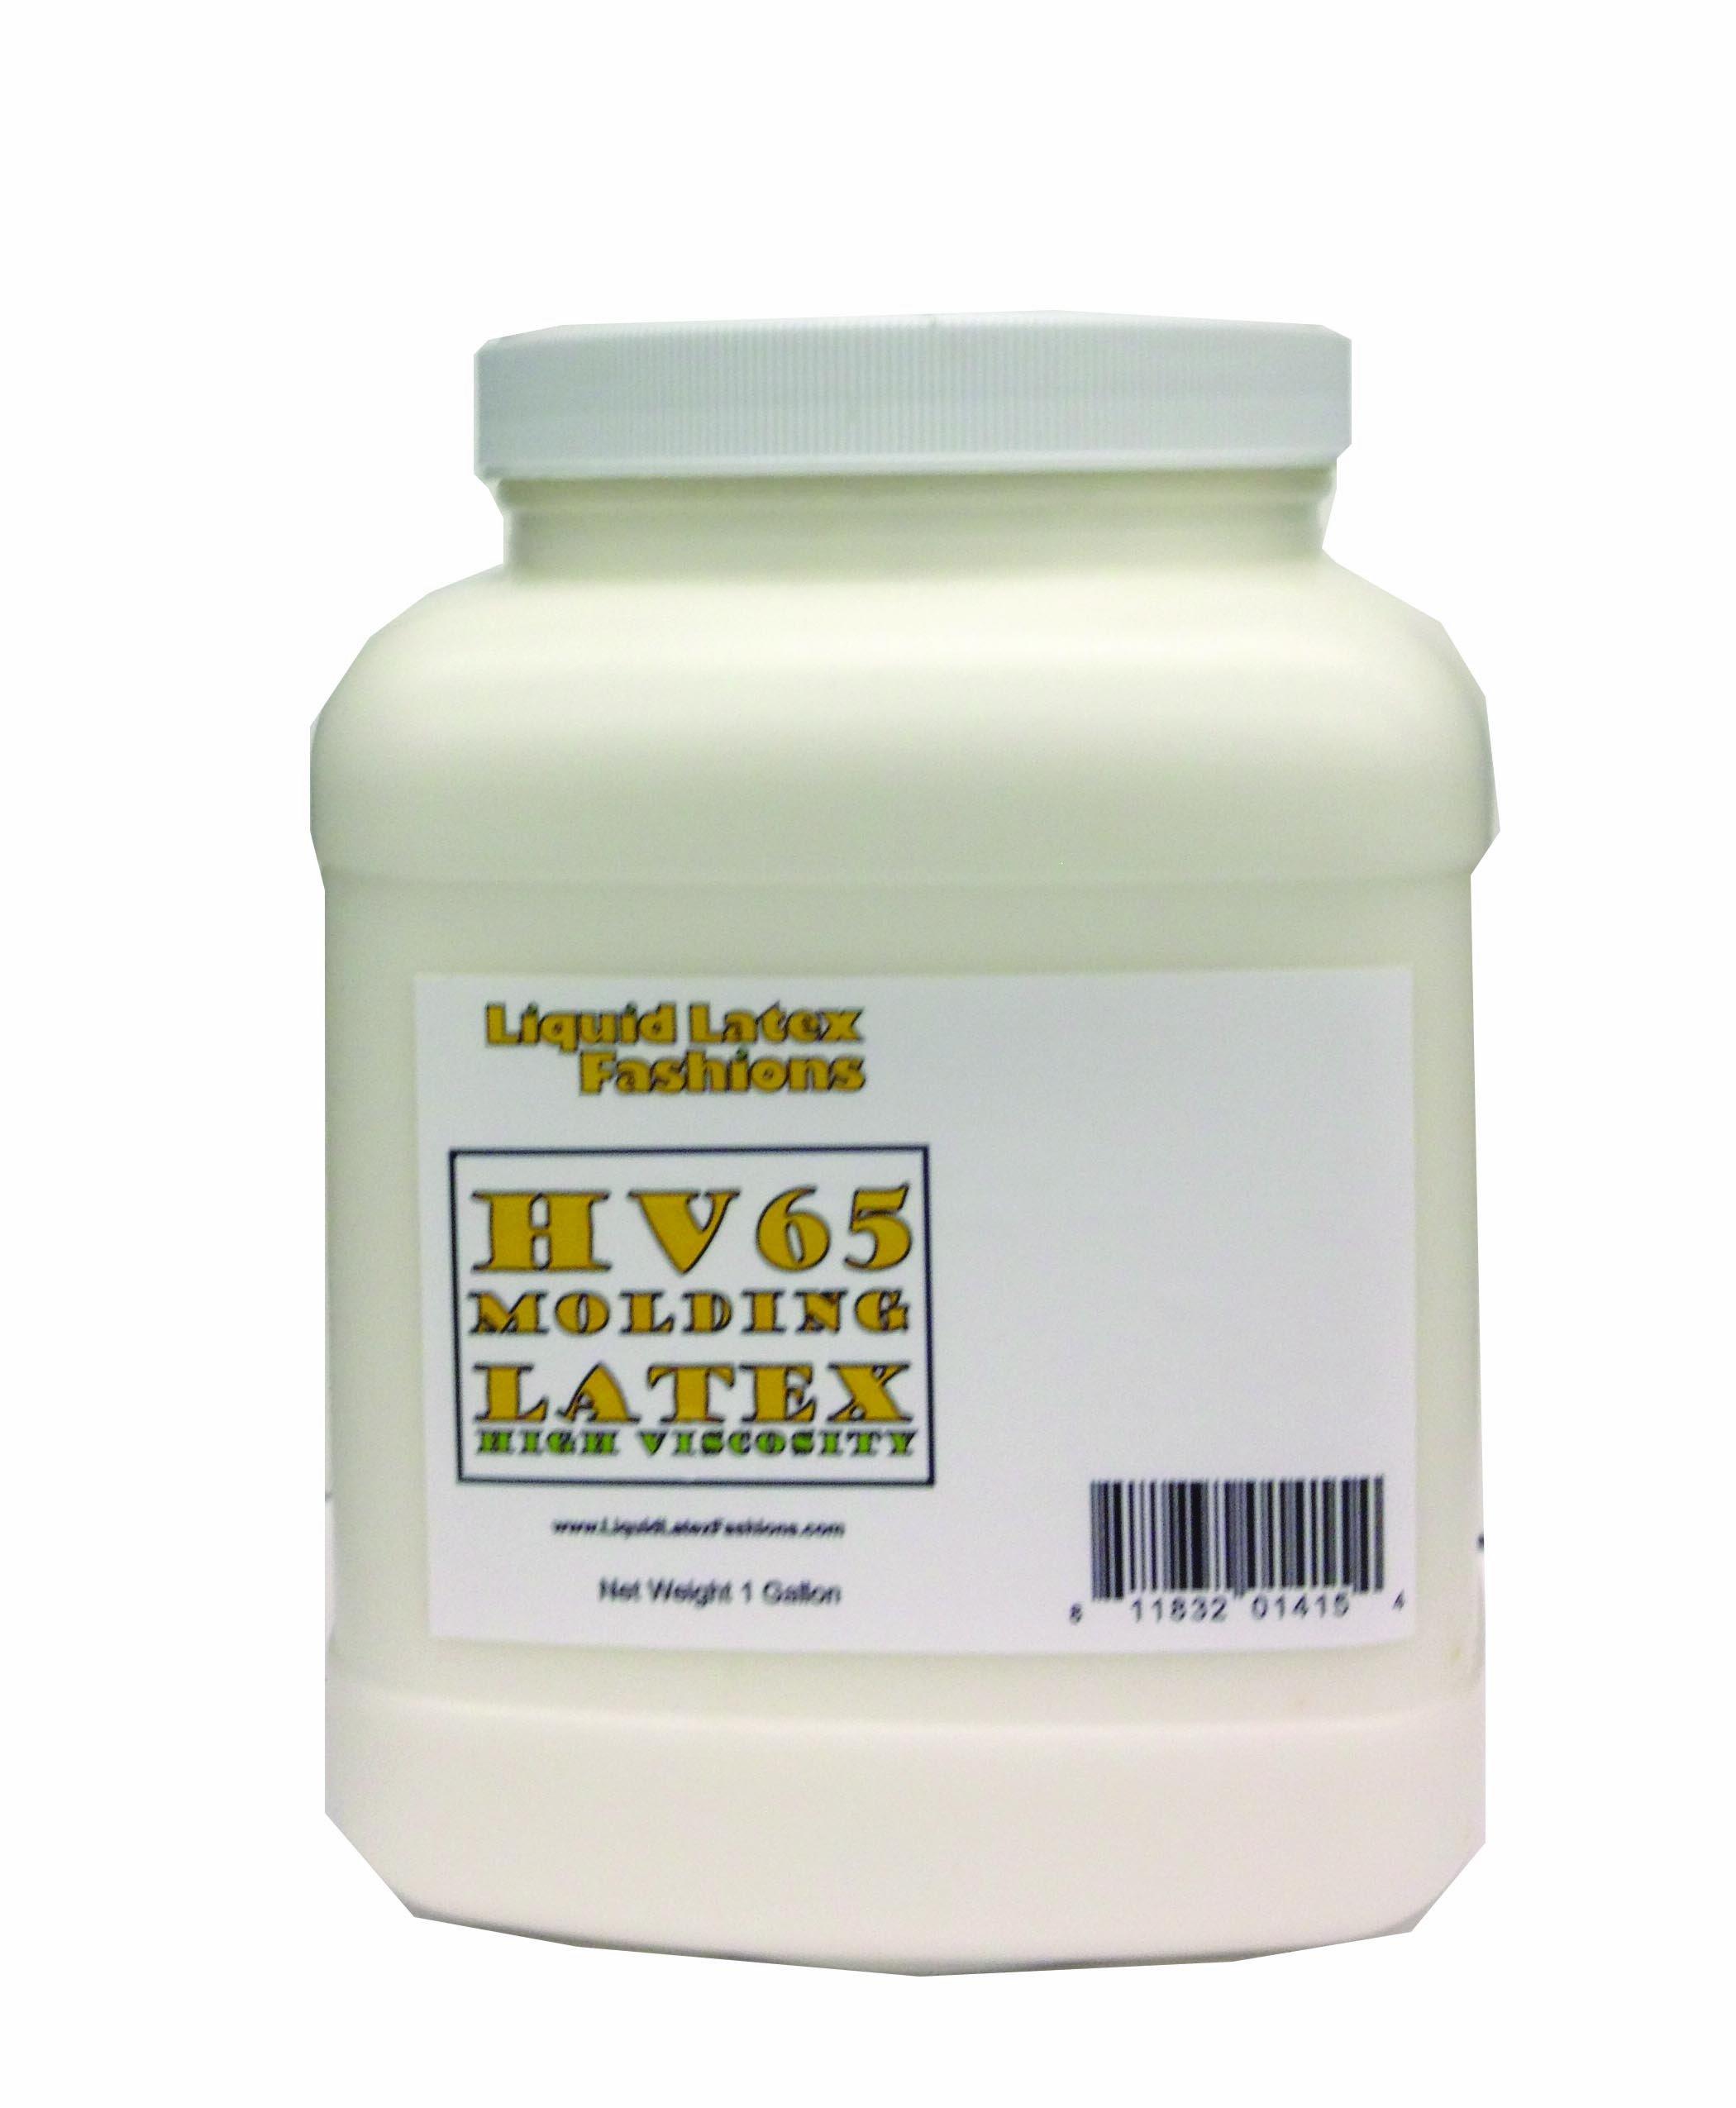 Hv65 Molding Latex (5 Gallon)